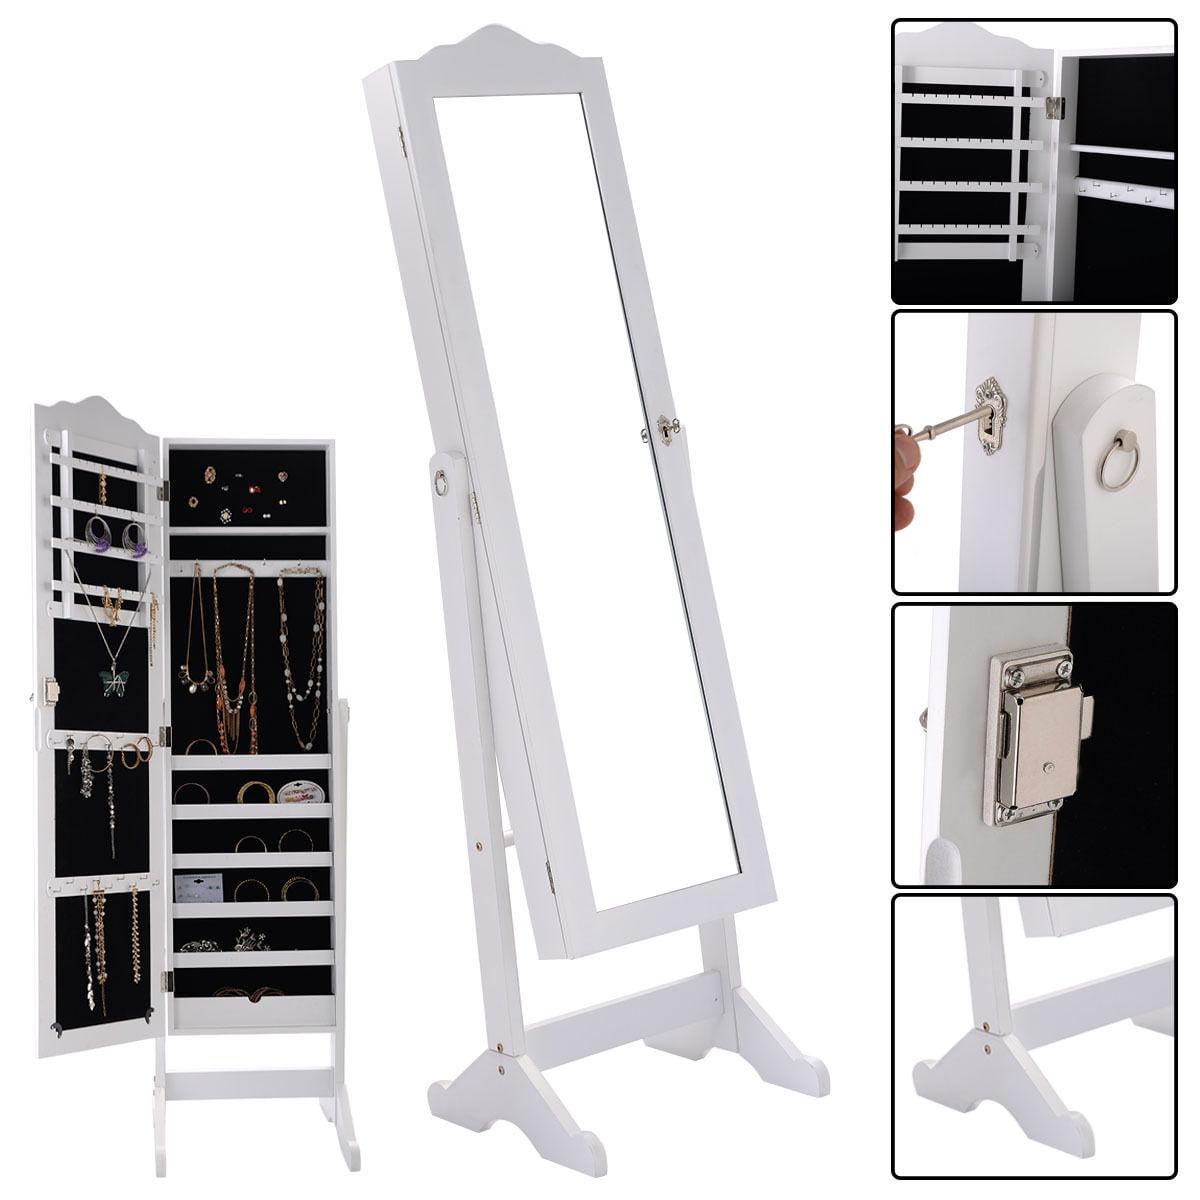 Armoire Mirrored Jewelry Cabinet Organizer Storage Box With Stand And Lock Walmart Com Walmart Com